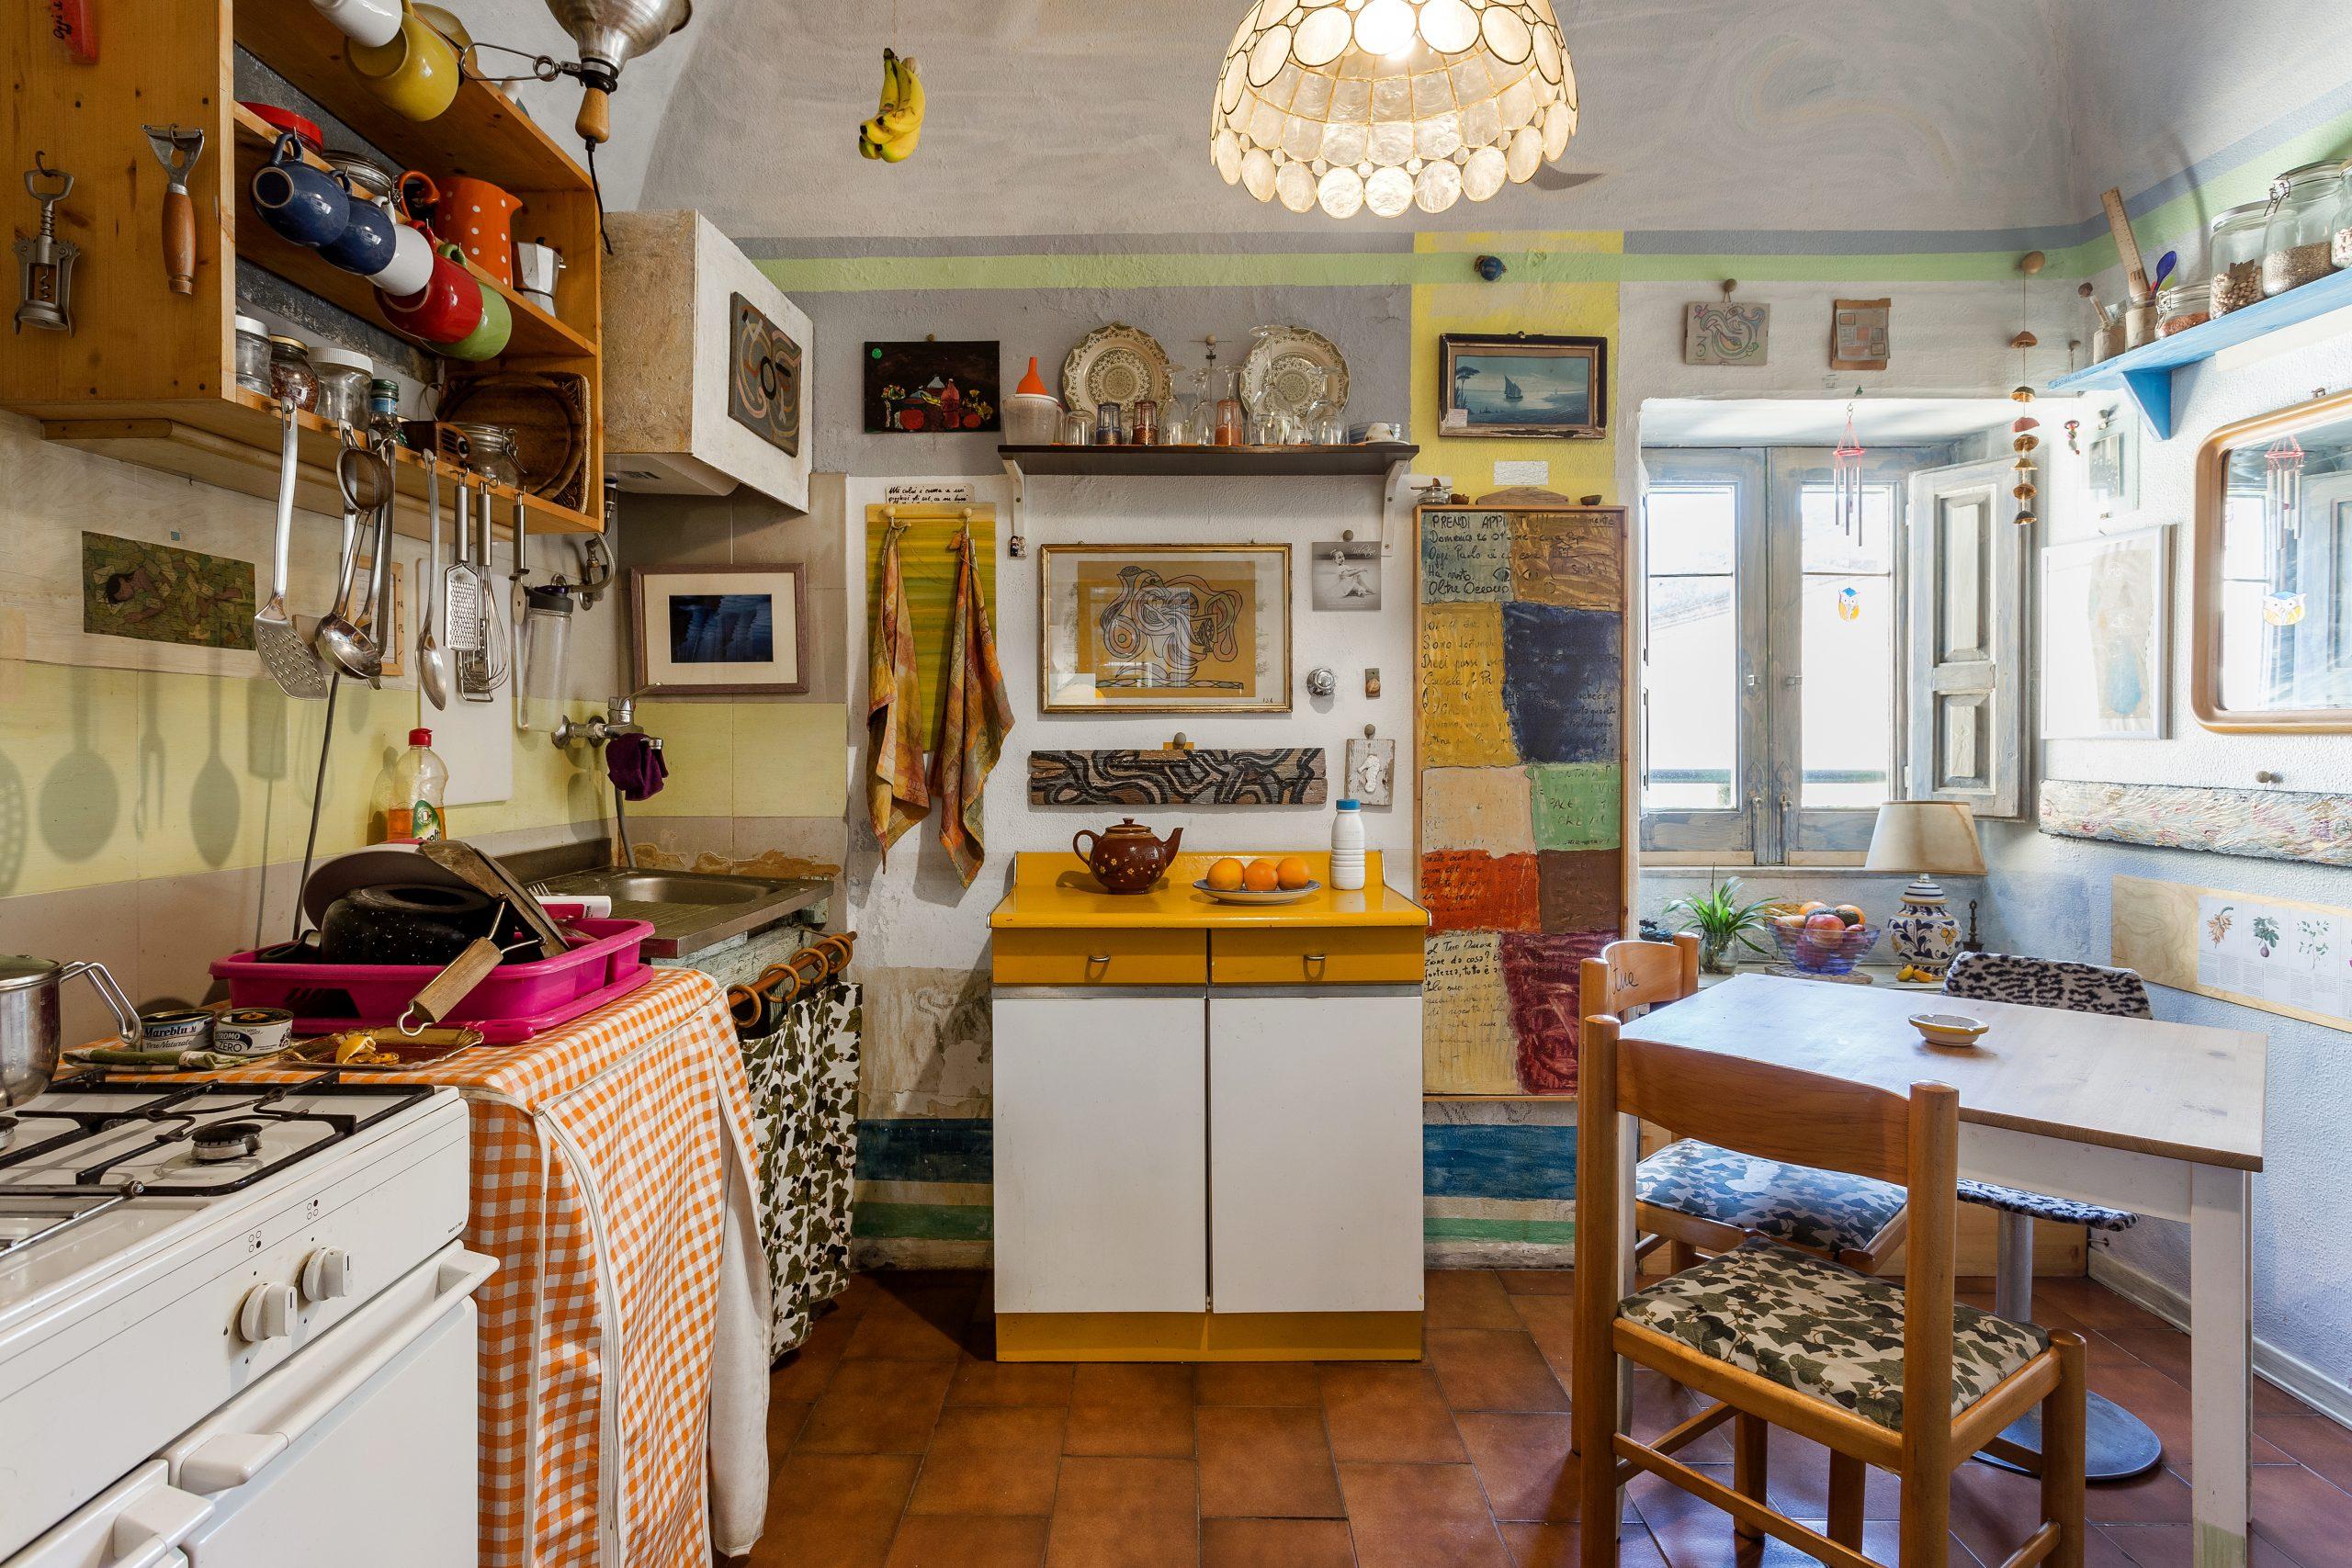 casa vacanze sicily needs love